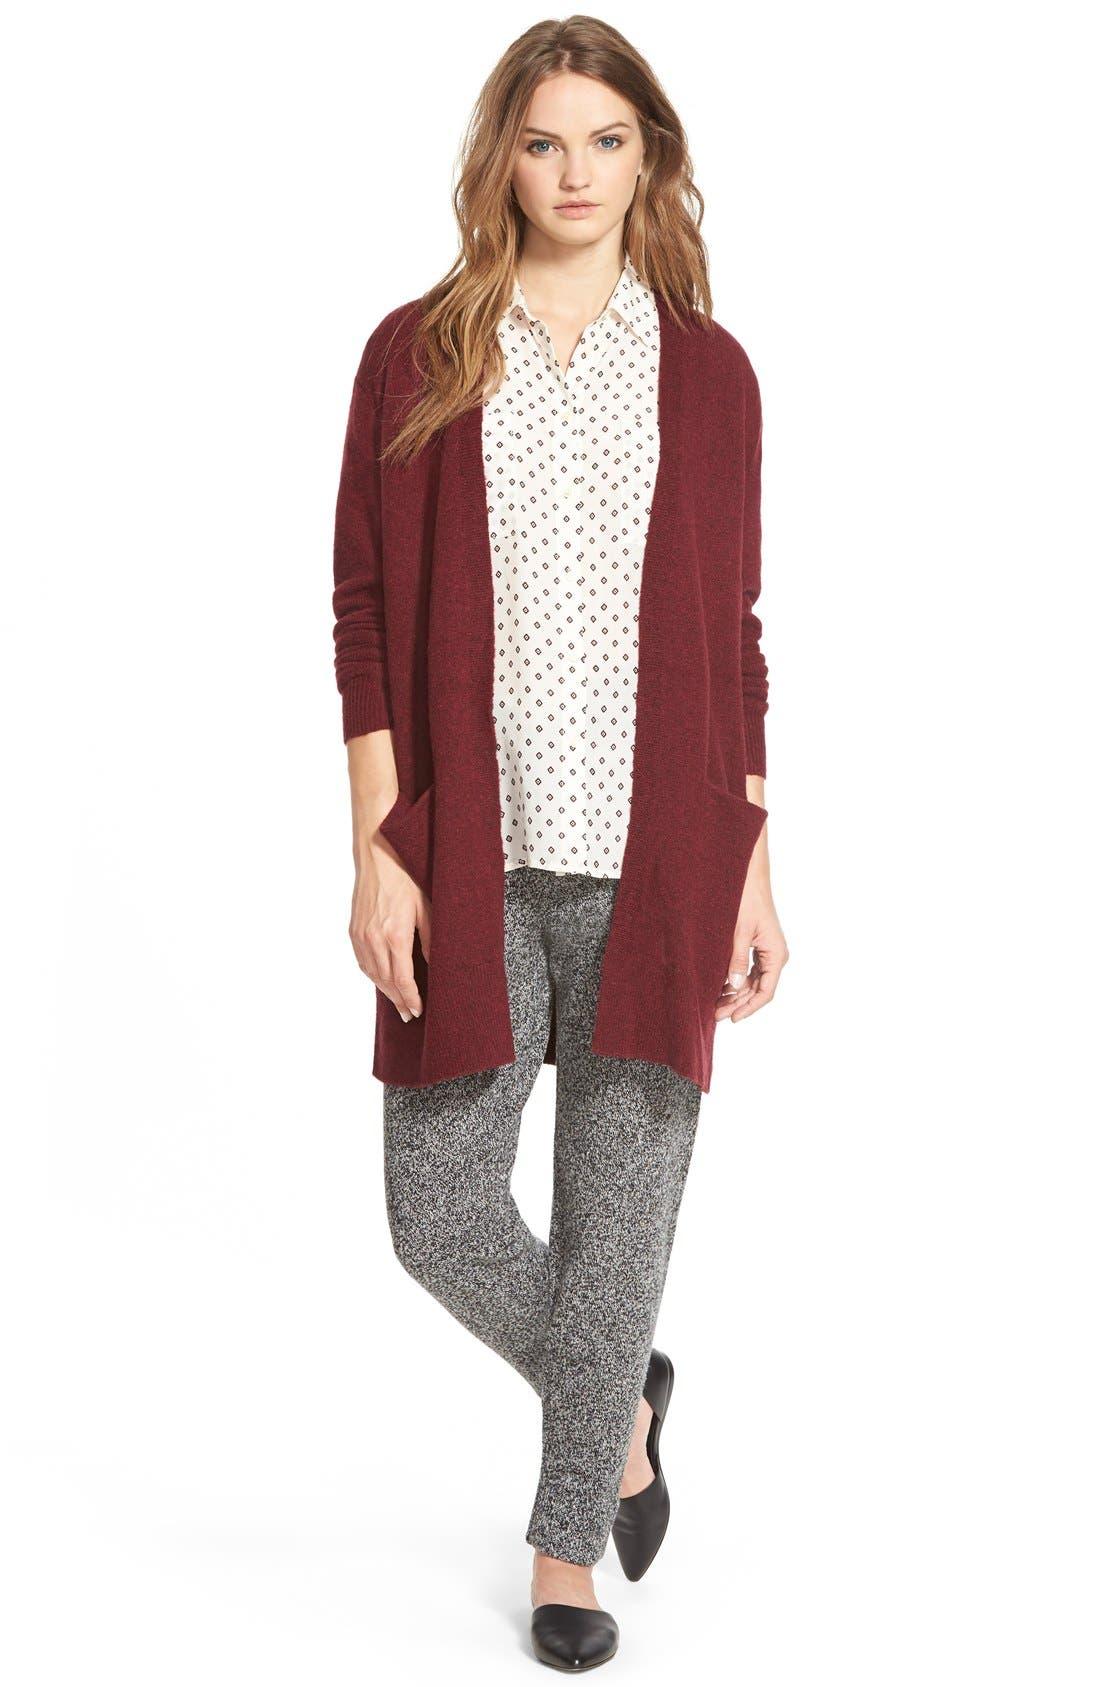 MADEWELL,                             'Foulard Dot' Silk Courier Shirt,                             Alternate thumbnail 4, color,                             900